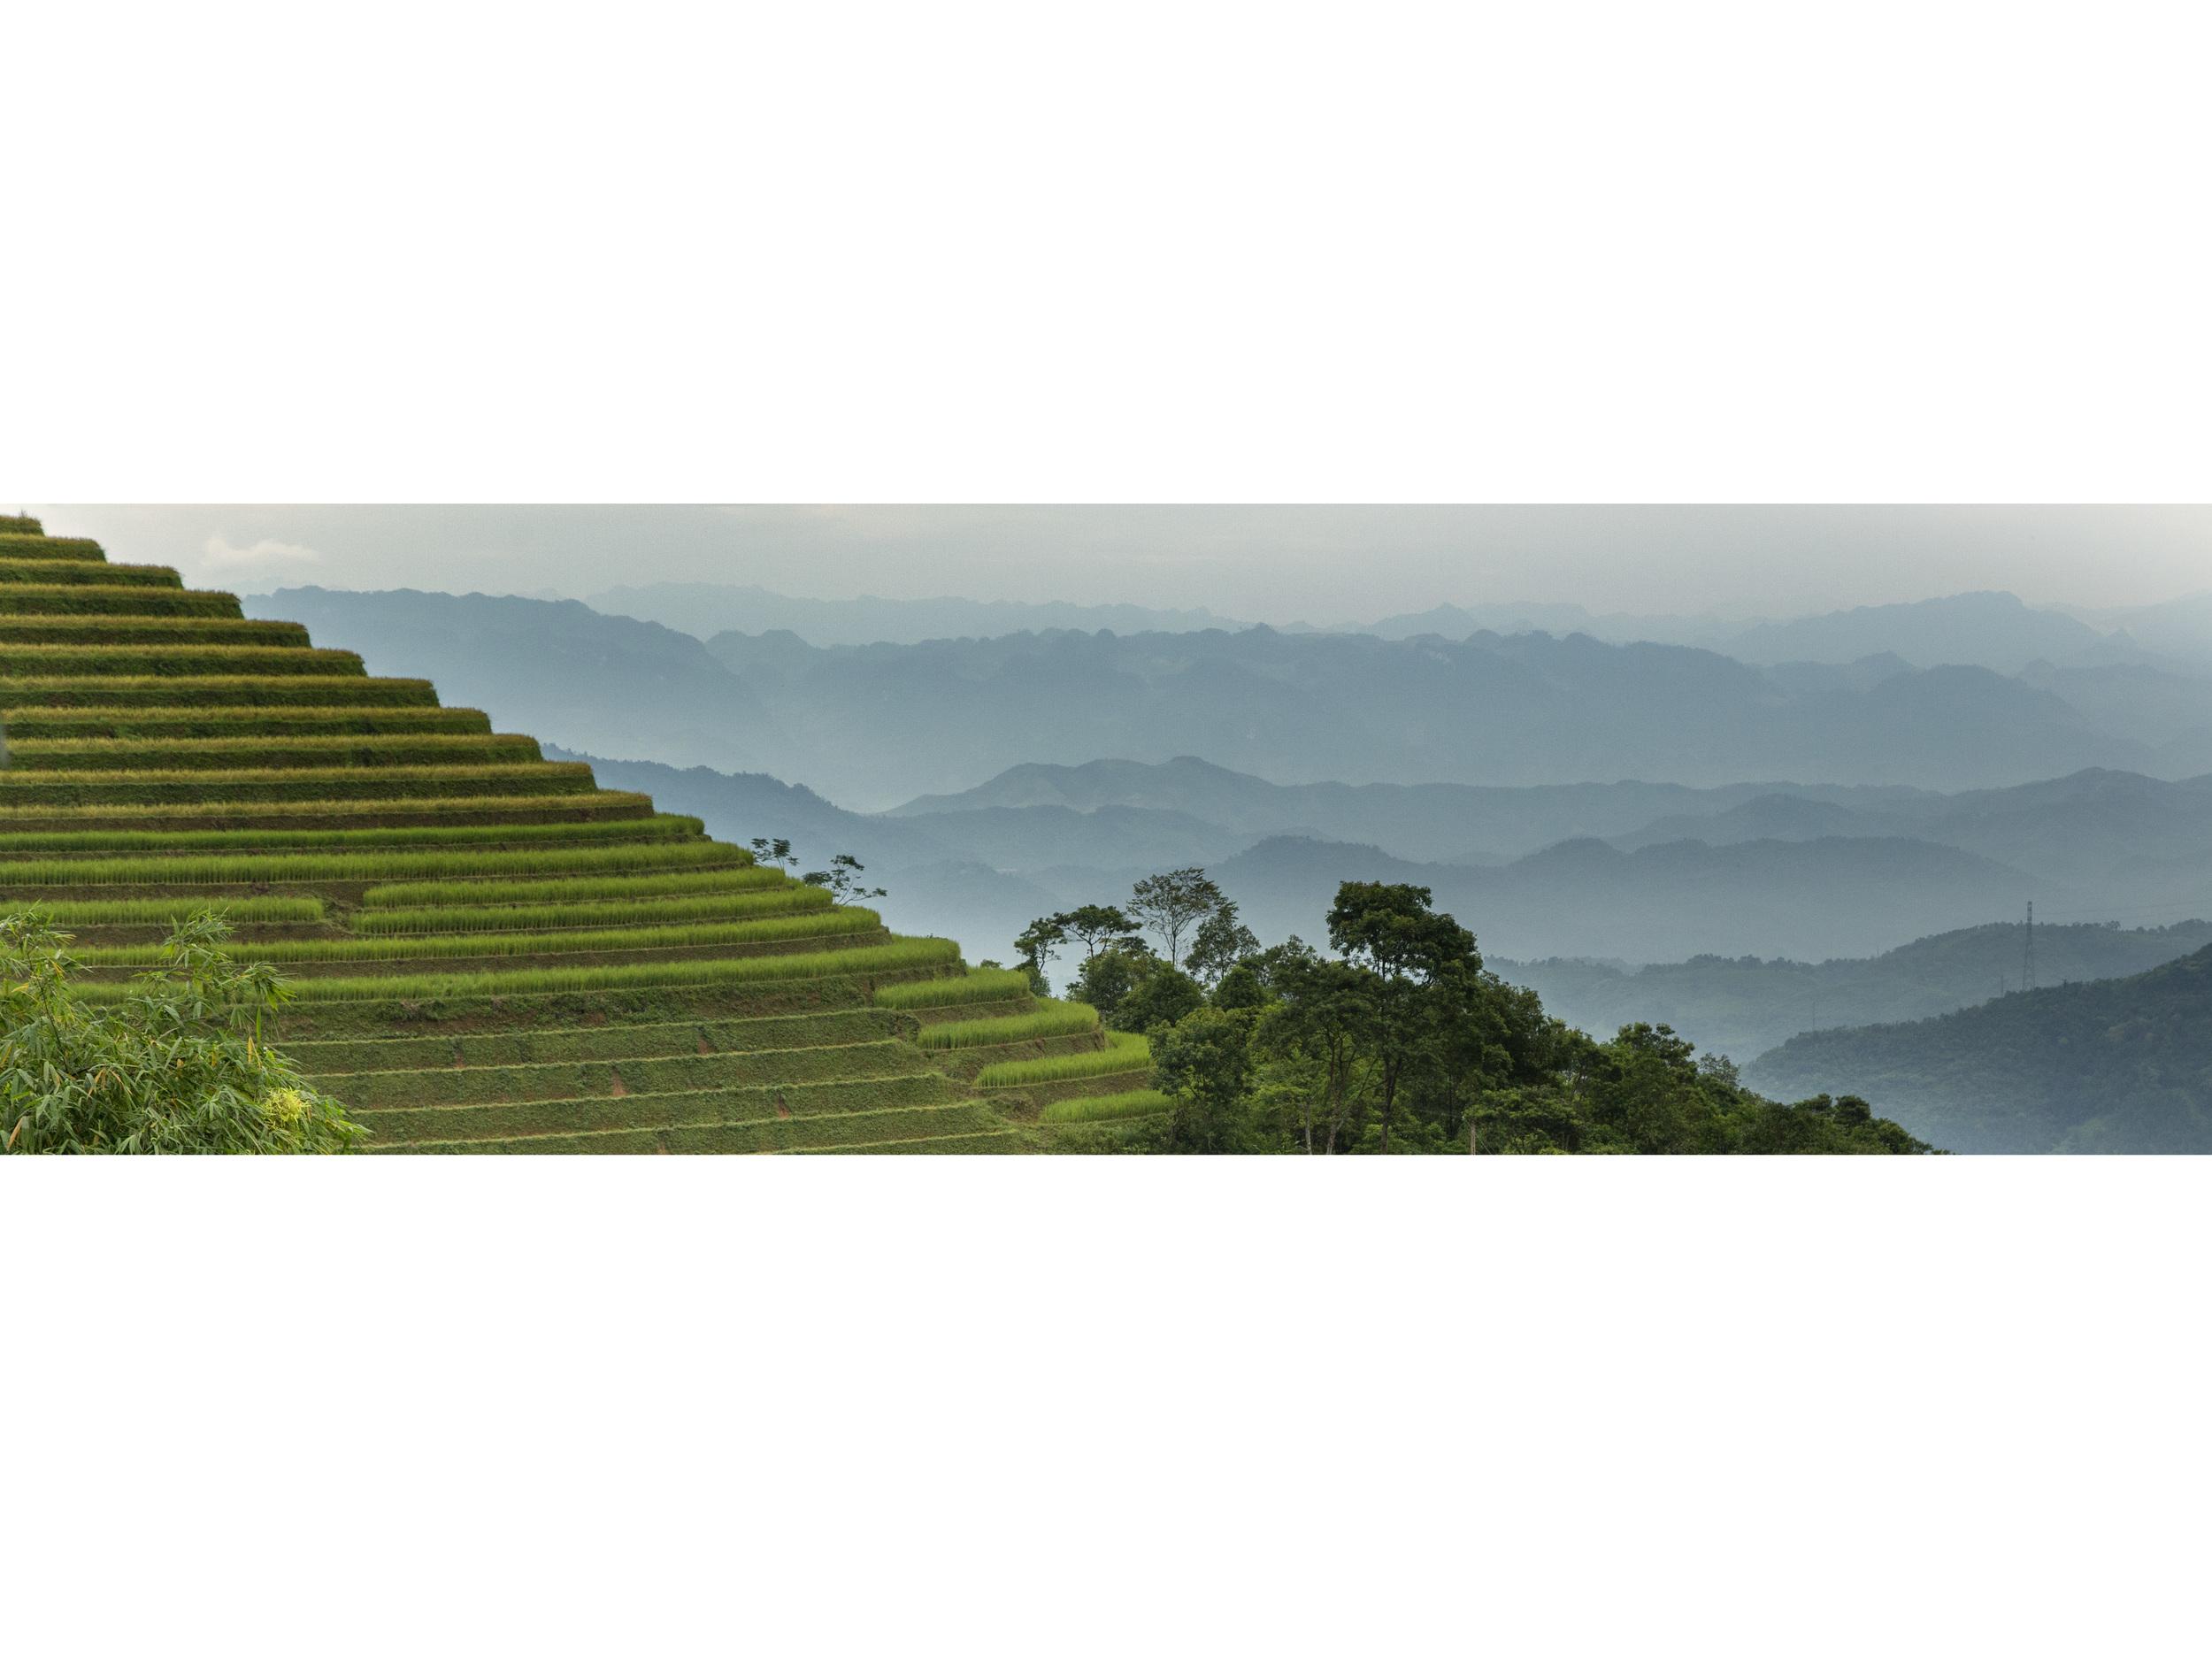 rice pyramid43.jpg